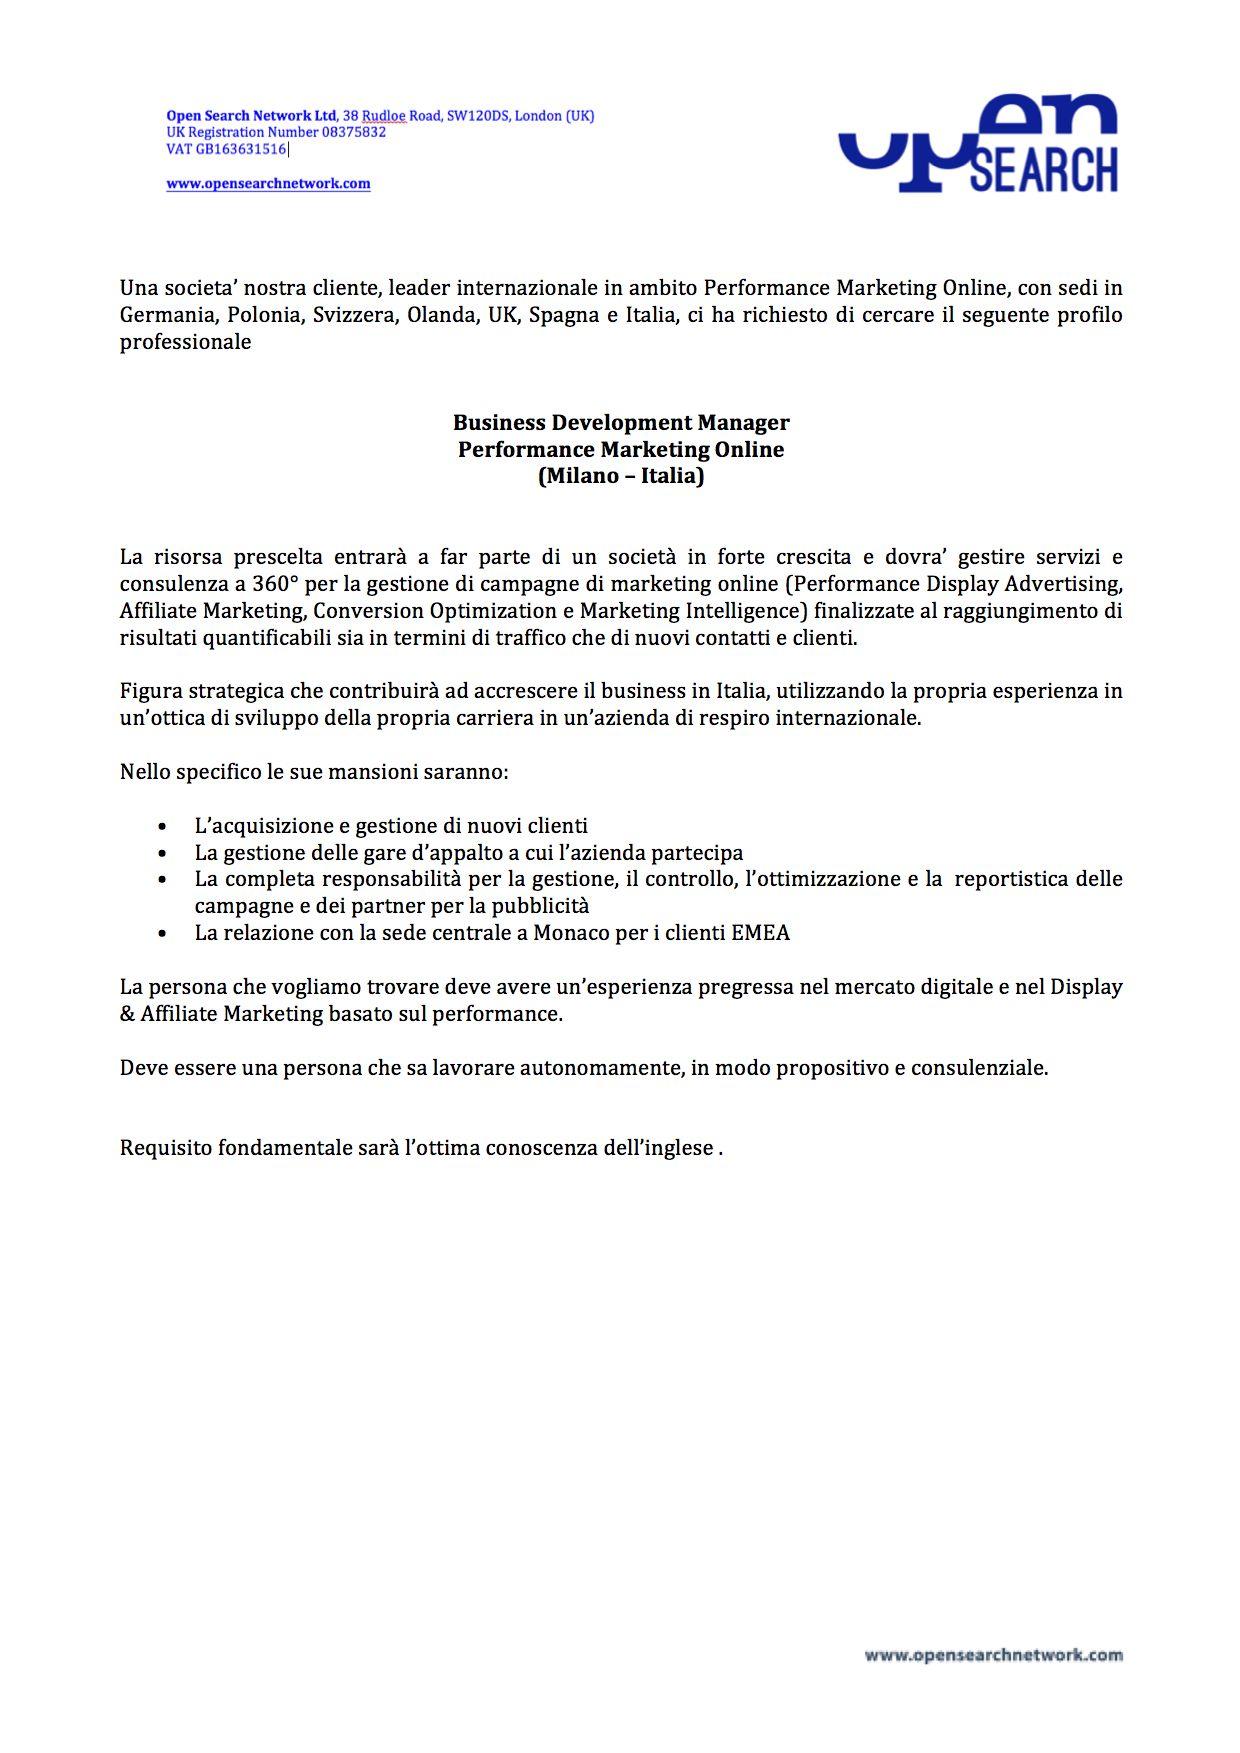 OS_Business Development Manager Performance Marketing Online (Milano – Italia) #Job #OpenSearch #BusinessDevelopmentManager #PerformanceMarketing #Analytics #Milan